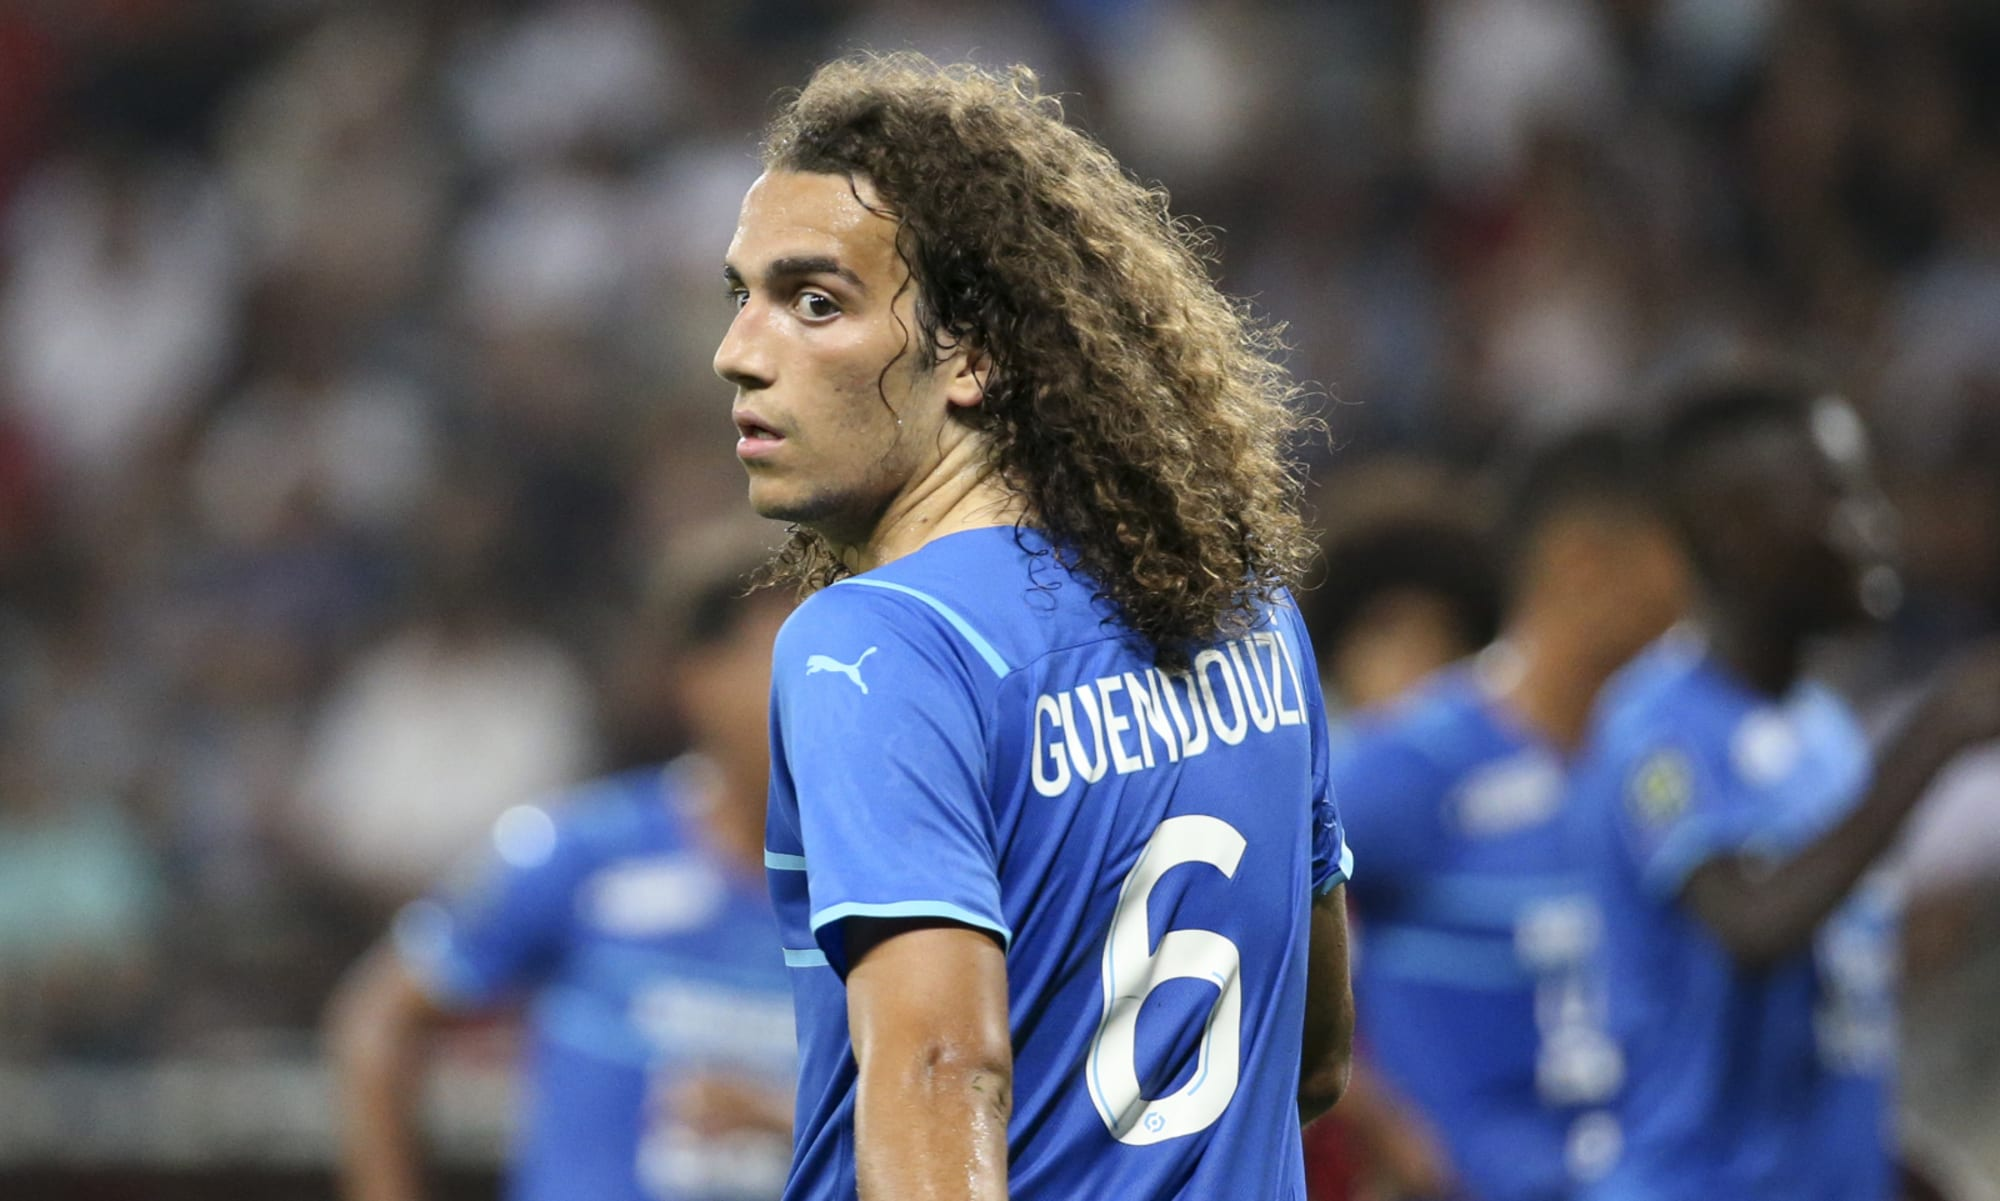 Arsenal: The chances of shock Matteo Guendouzi return